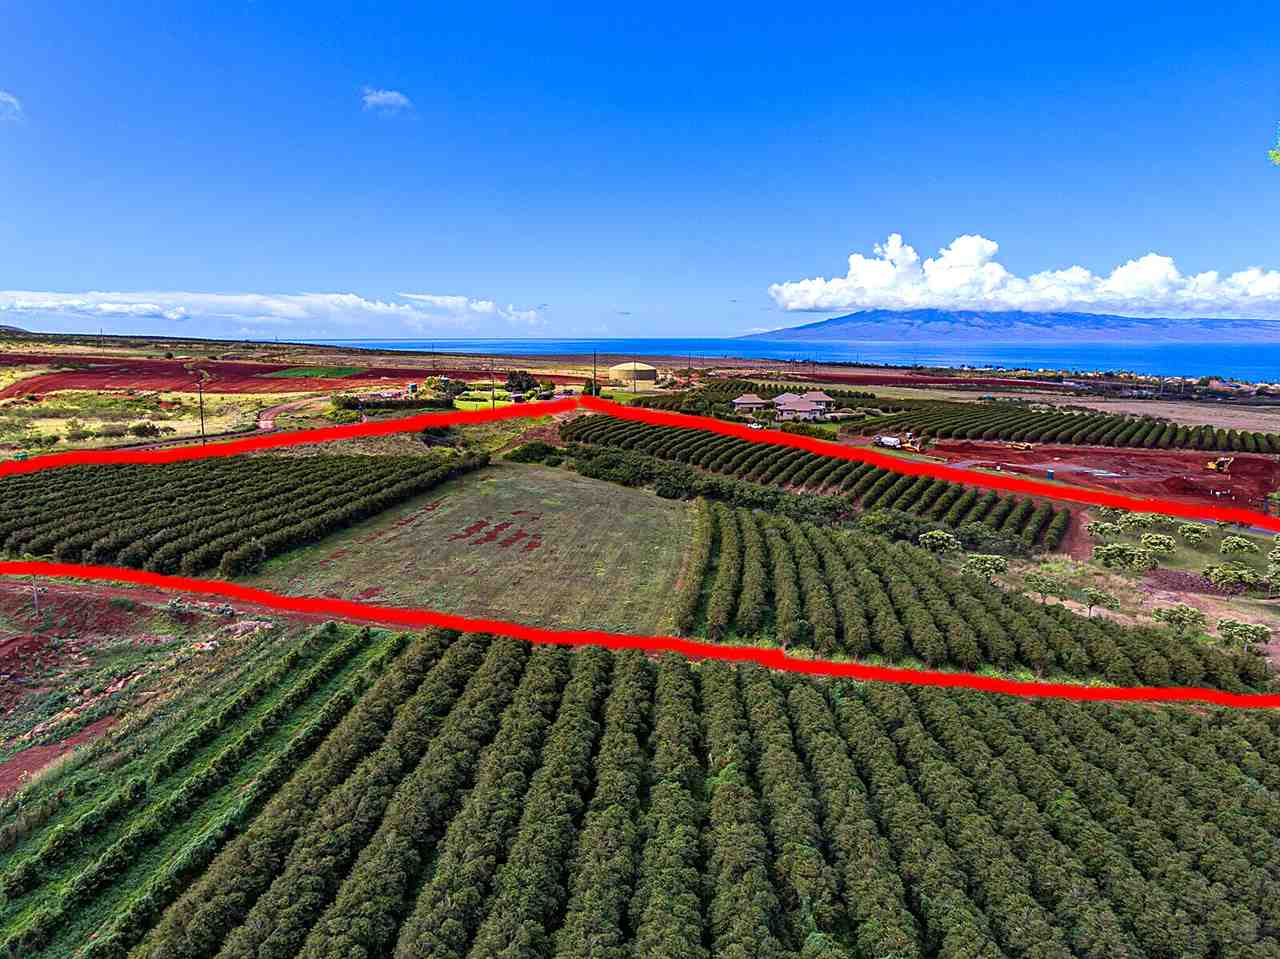 100 Aina Mahiai St Lahaina, Hi 96761 vacant land - photo 1 of 6